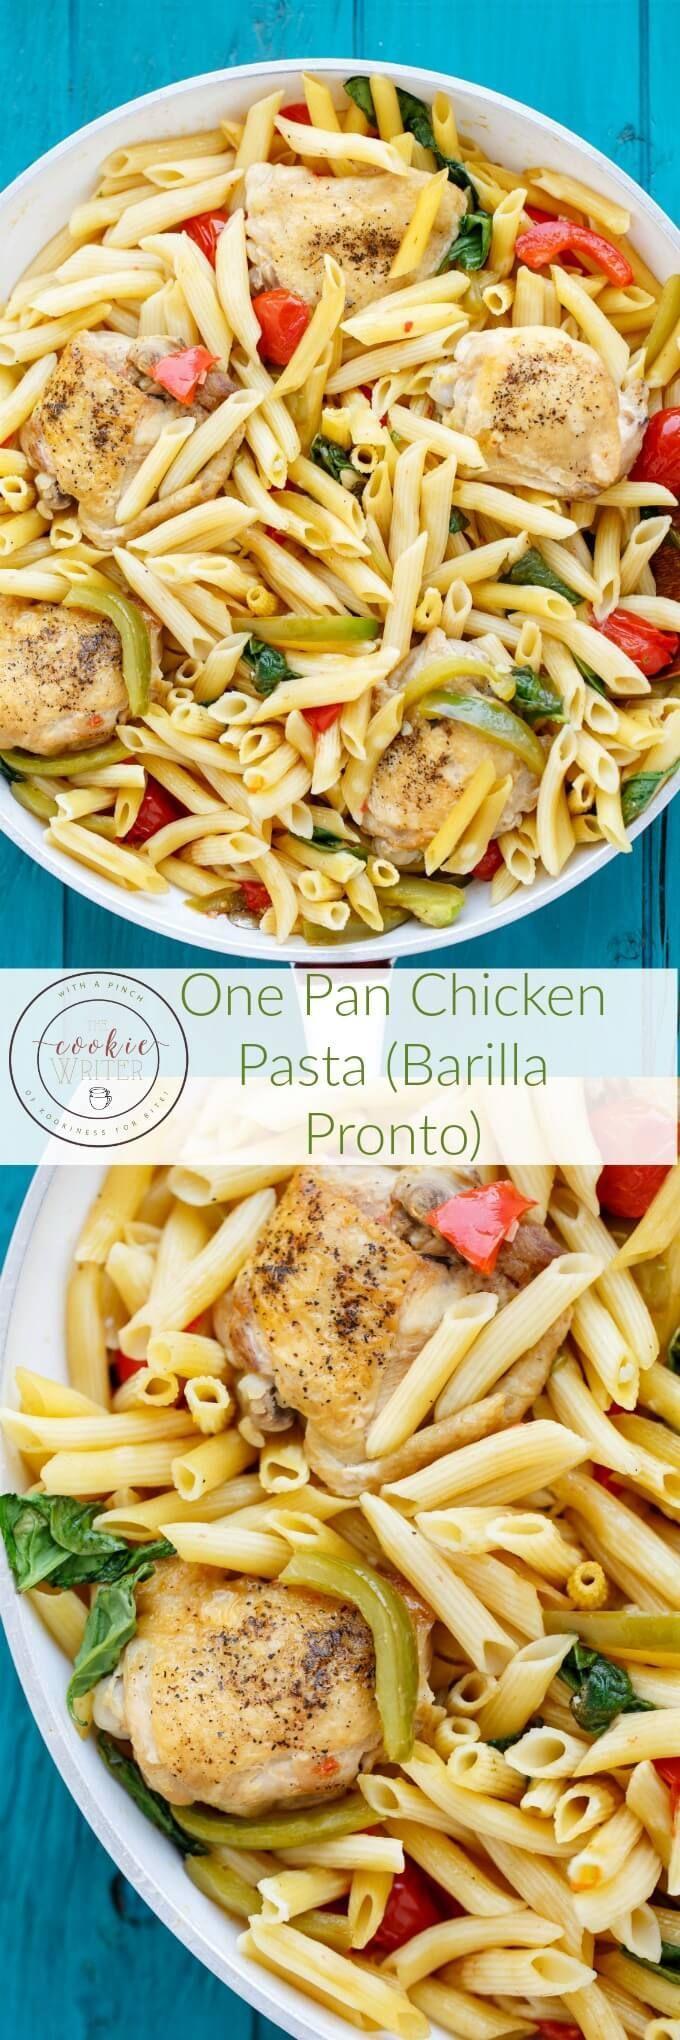 One Pan Chicken Pasta using Barilla Pronto Pasta | http://thecookiewriter.com | @thecookiewriter | #pasta (ad)